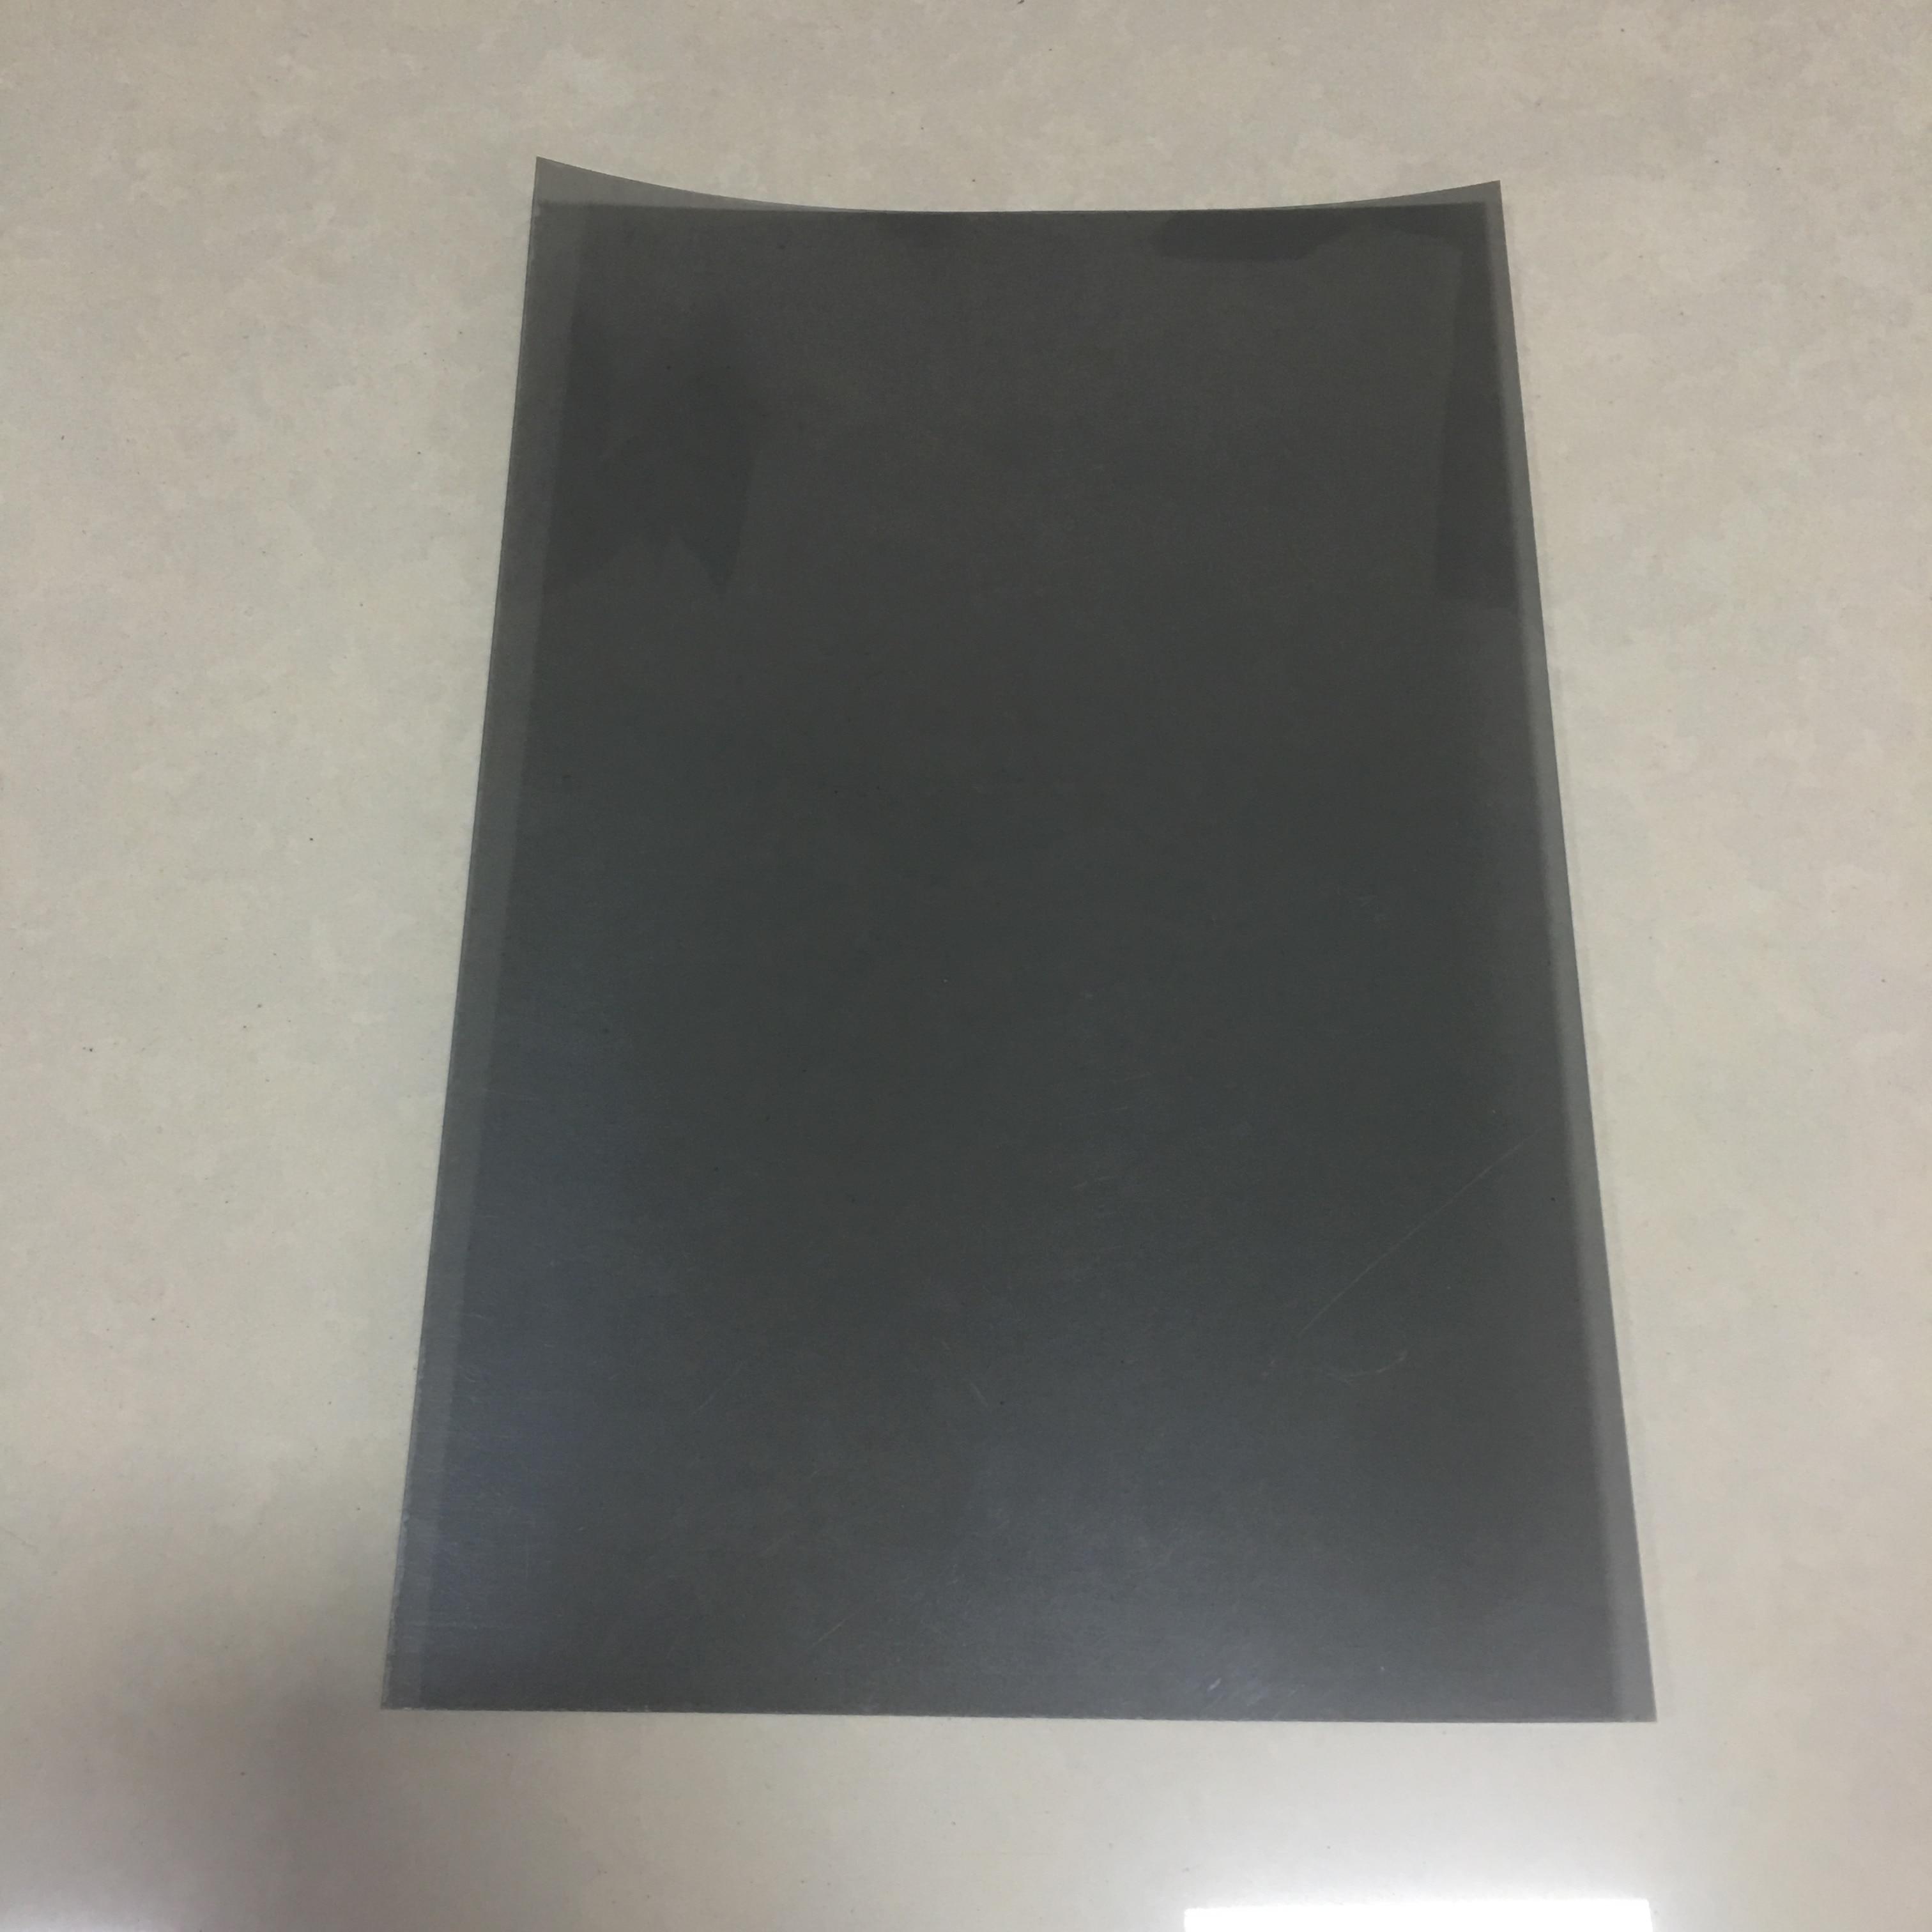 1pcs 30*20CM Horizontal 0 degree Polarizer Film for LCD,Linear Polarized Filter,Linear Polarizing Polarization Film Sheets(China)